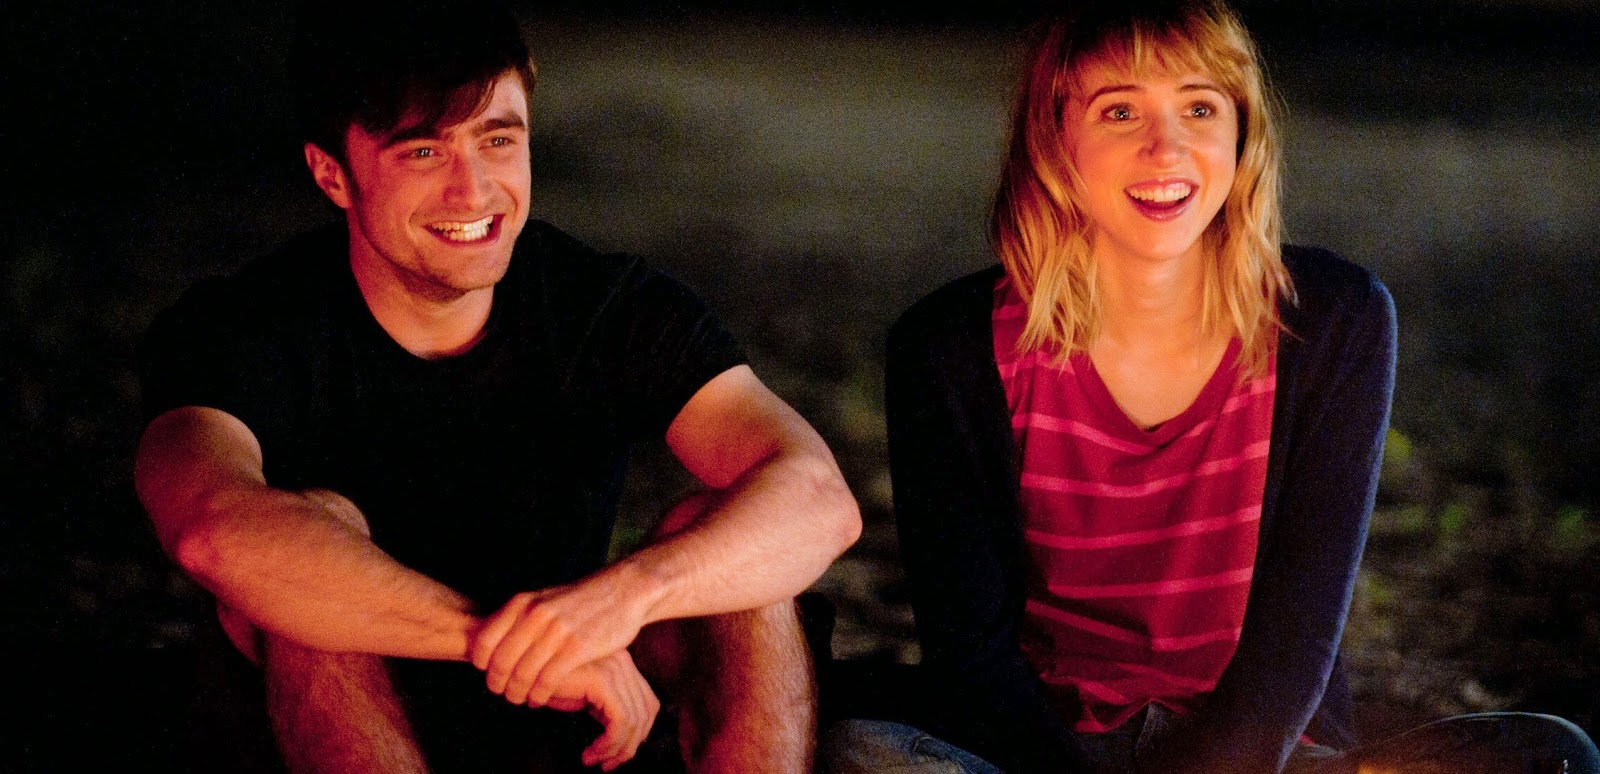 Daniel Radcliffe e Zoe Cazan no trailer da comédia romântica What If